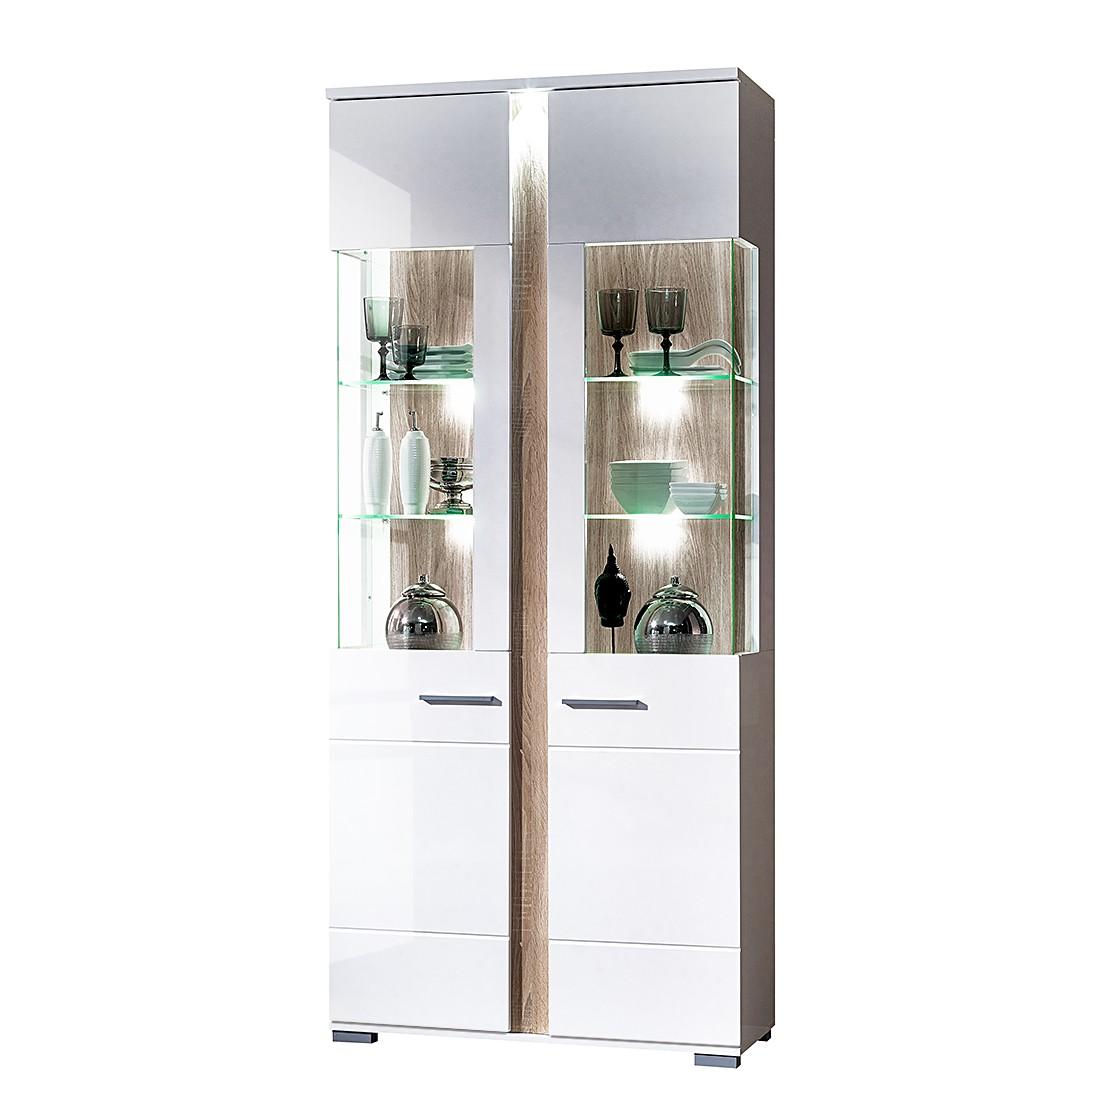 EEK A+, Armoire vitrine Campo (avec éclairage) - Blanc brillant / Imitation chêne de Sonoma clair -